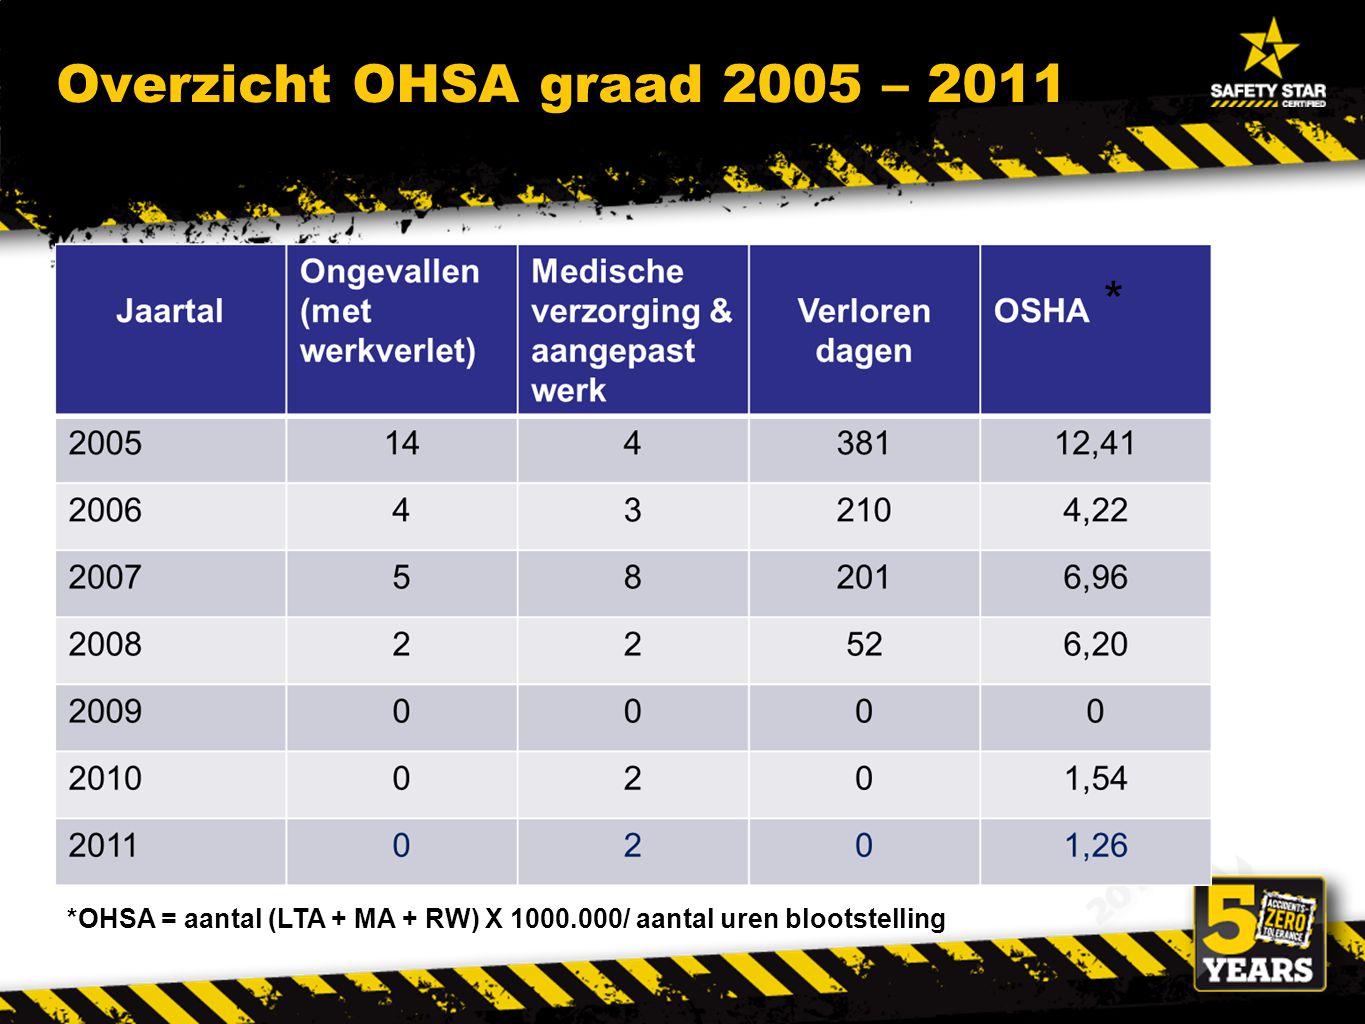 *OHSA = aantal (LTA + MA + RW) X 1000.000/ aantal uren blootstelling